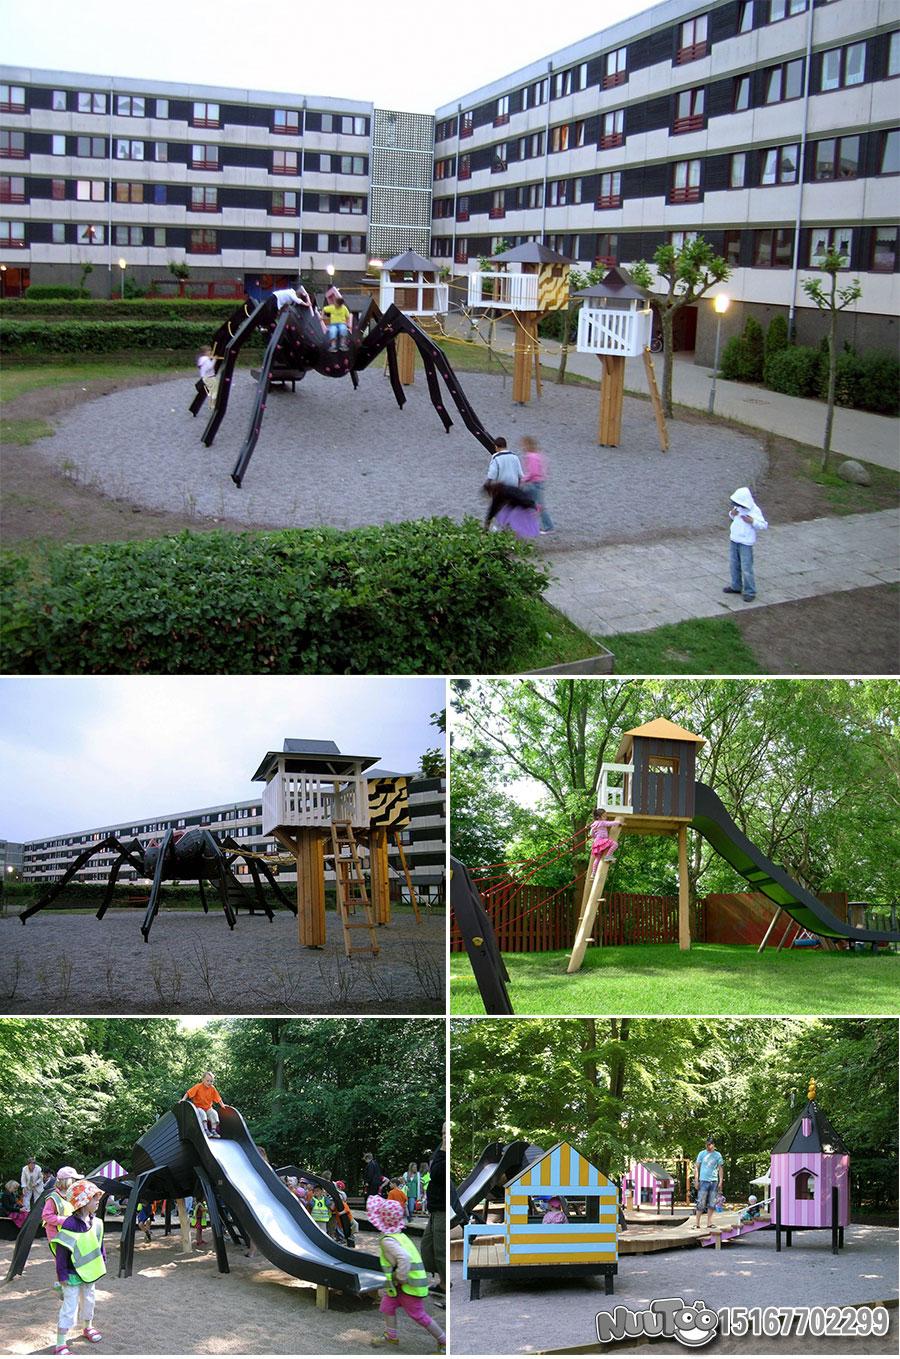 Non-standard amusement + personalized playground + amusement equipment + rides + outdoor children's play facilities _07